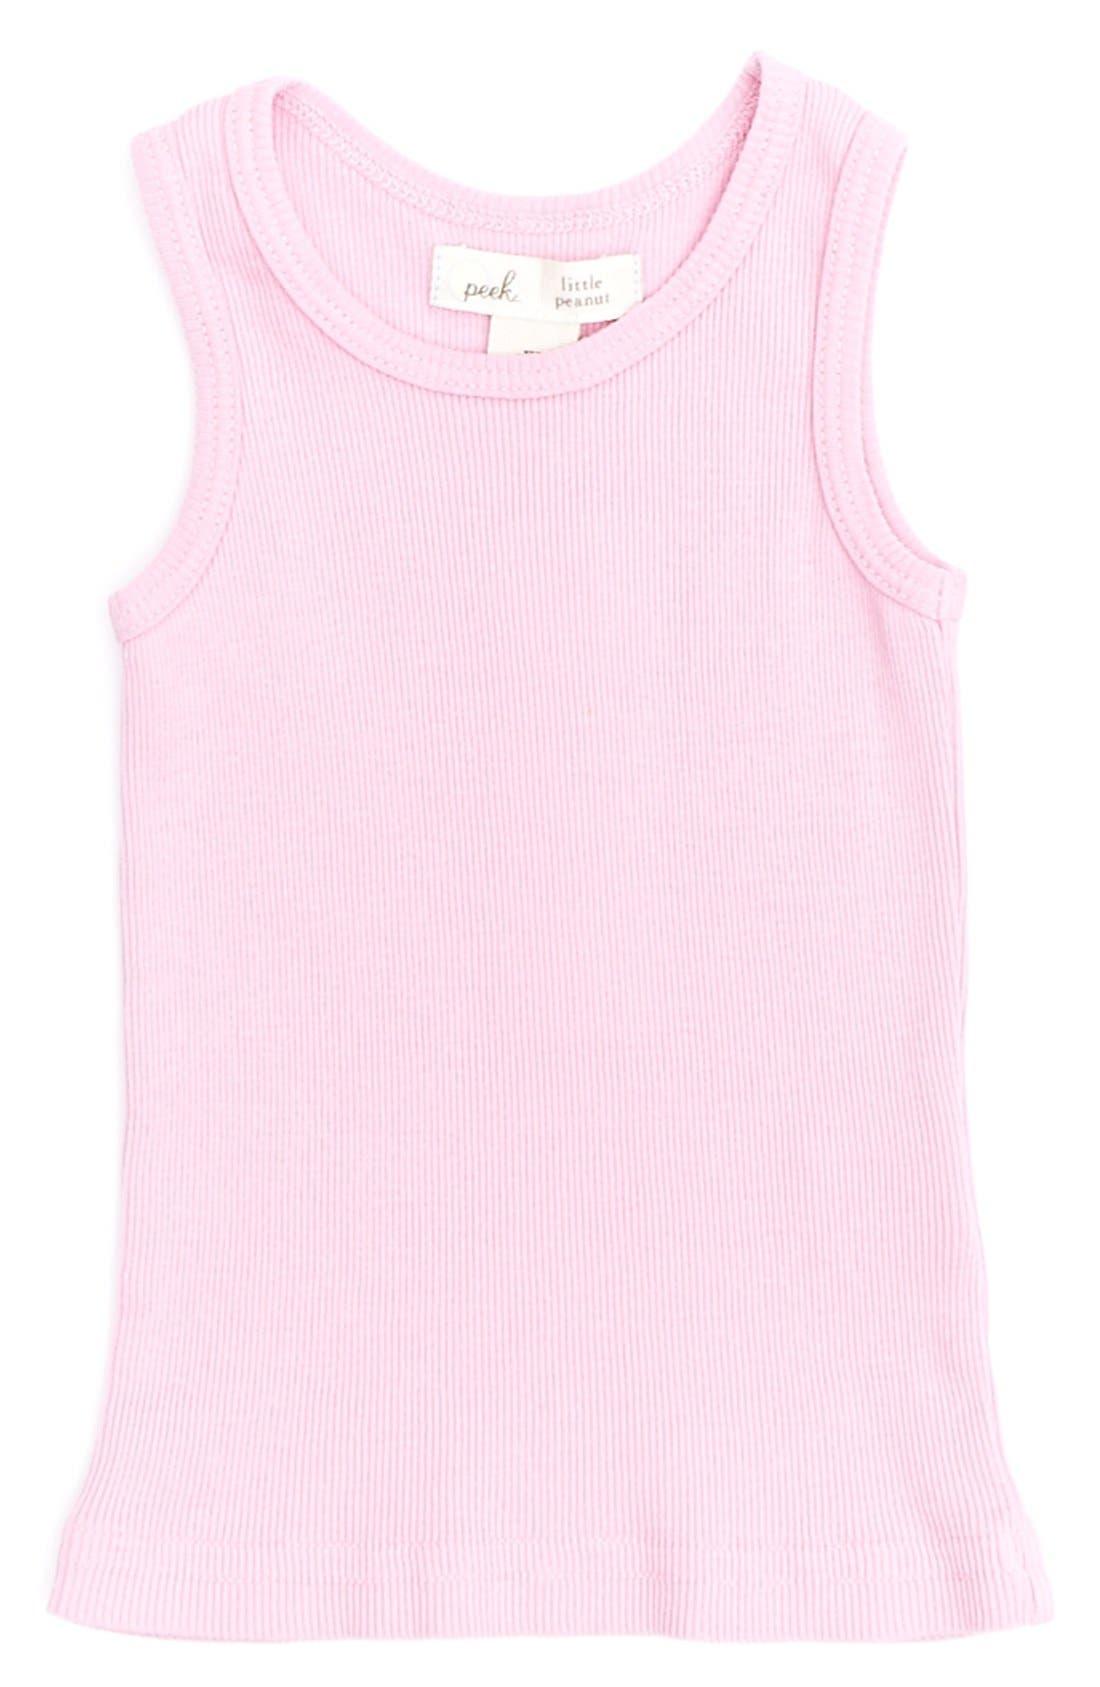 Main Image - Peek 'Little Peanut' Supima® Cotton Tank Top (Baby Girls)